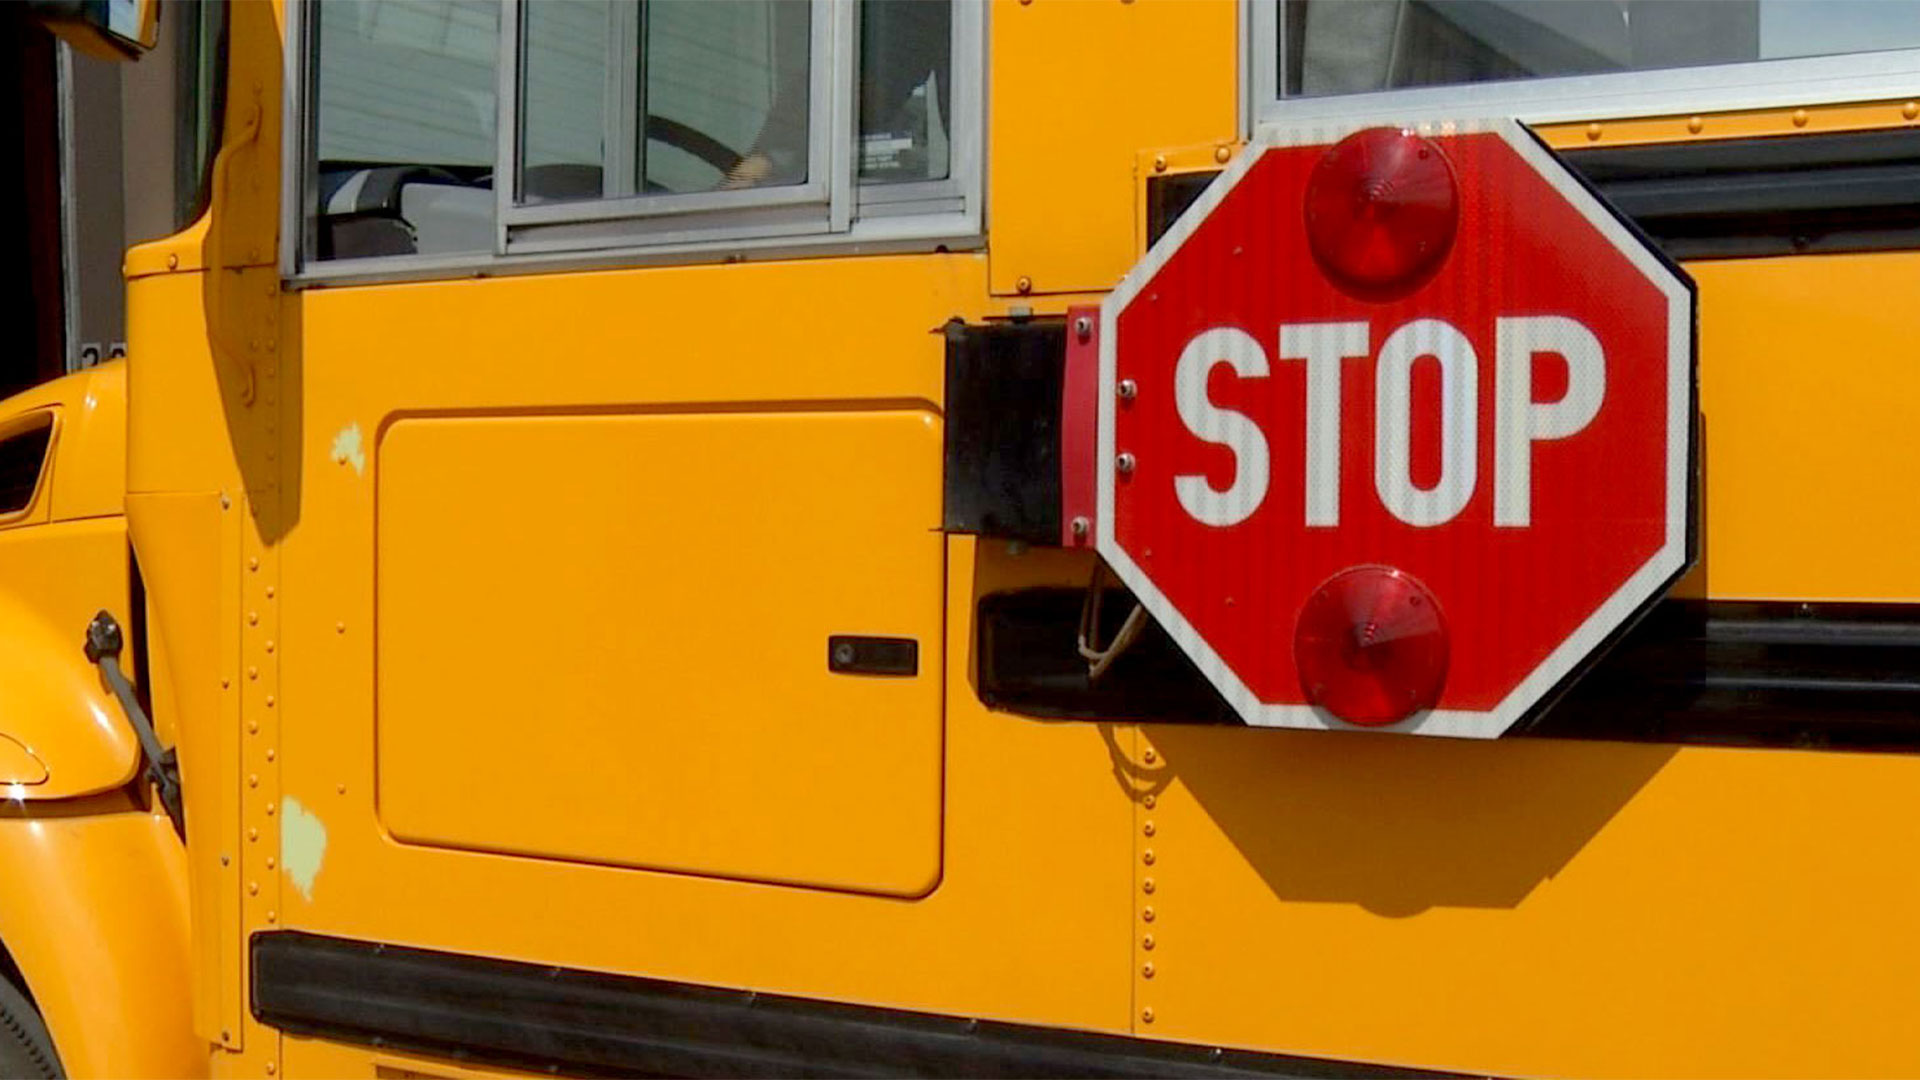 KELO school bus student transportation